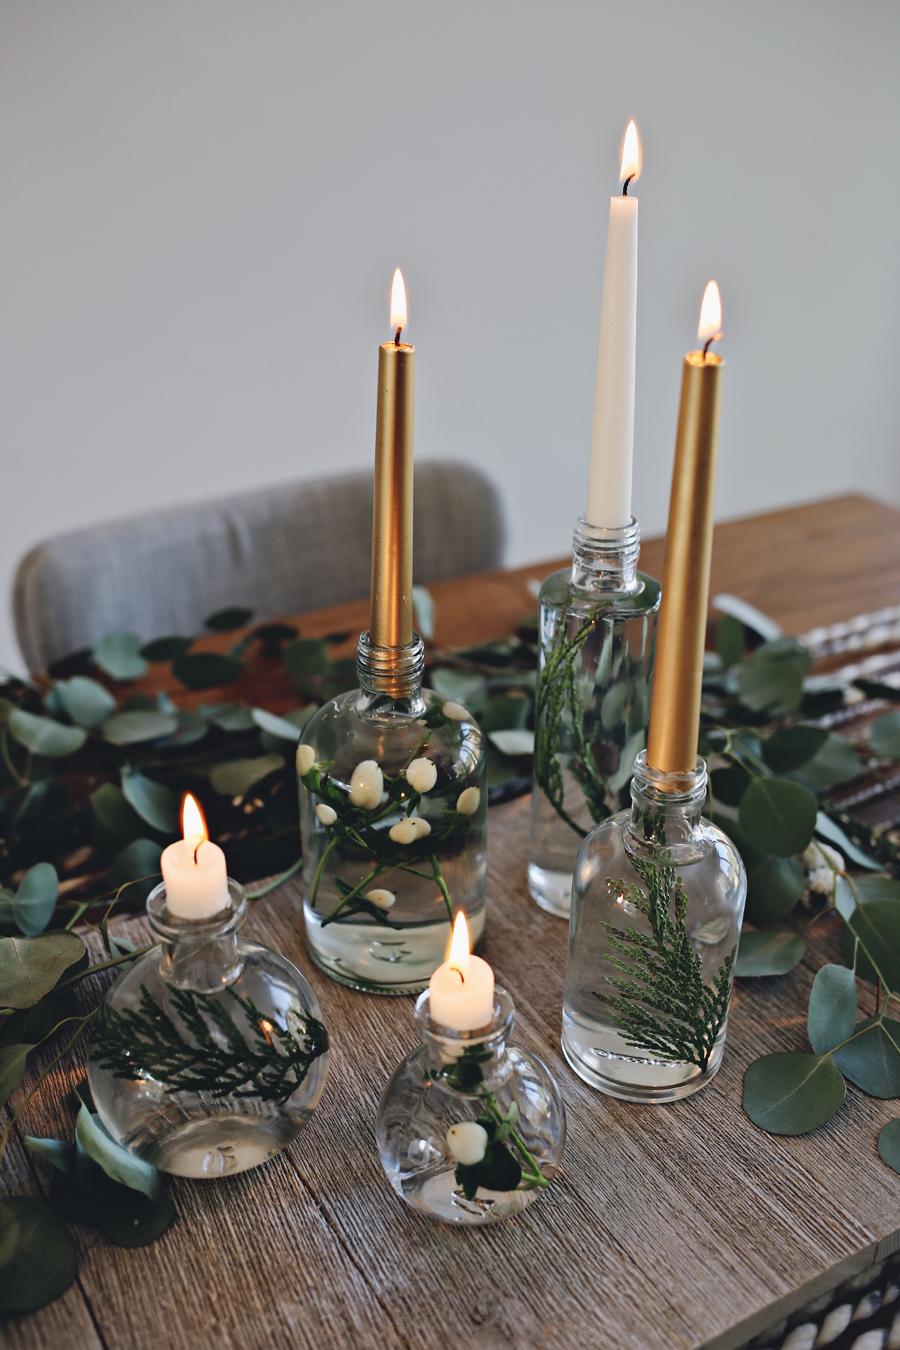 winter-solstice-centerpiece-diy-kristin-guy-dine-x-design